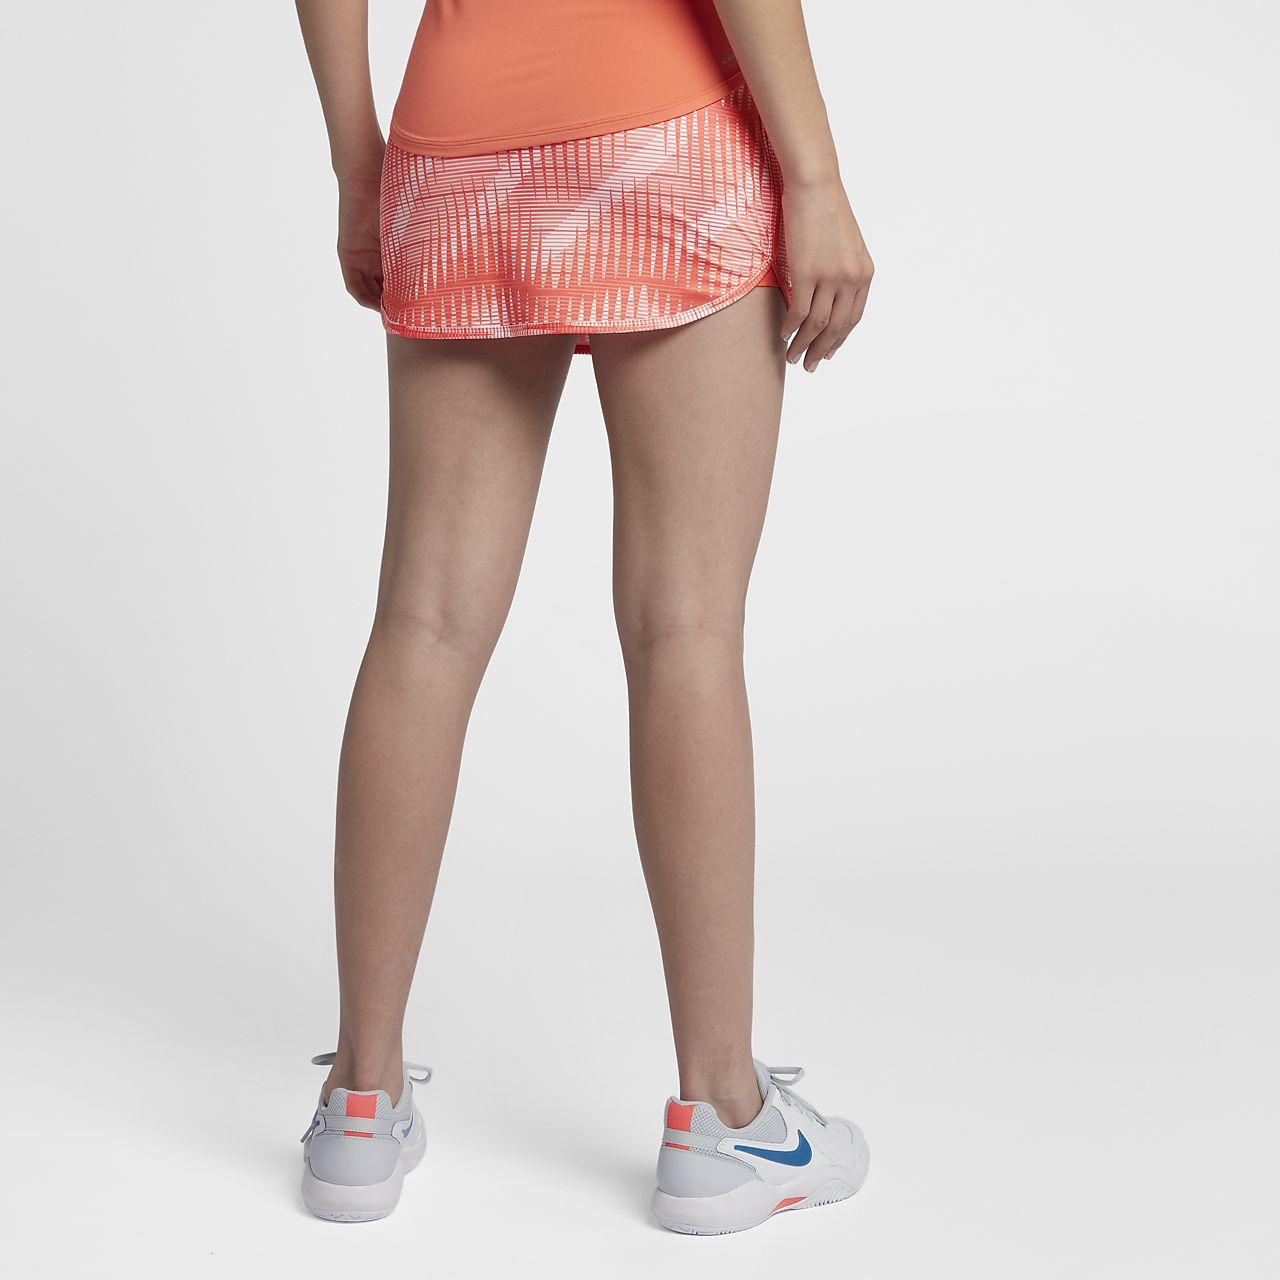 5b6cf04bb38 Low Resolution NikeCourt Pure Women s Tennis Skirt NikeCourt Pure Women s  Tennis Skirt